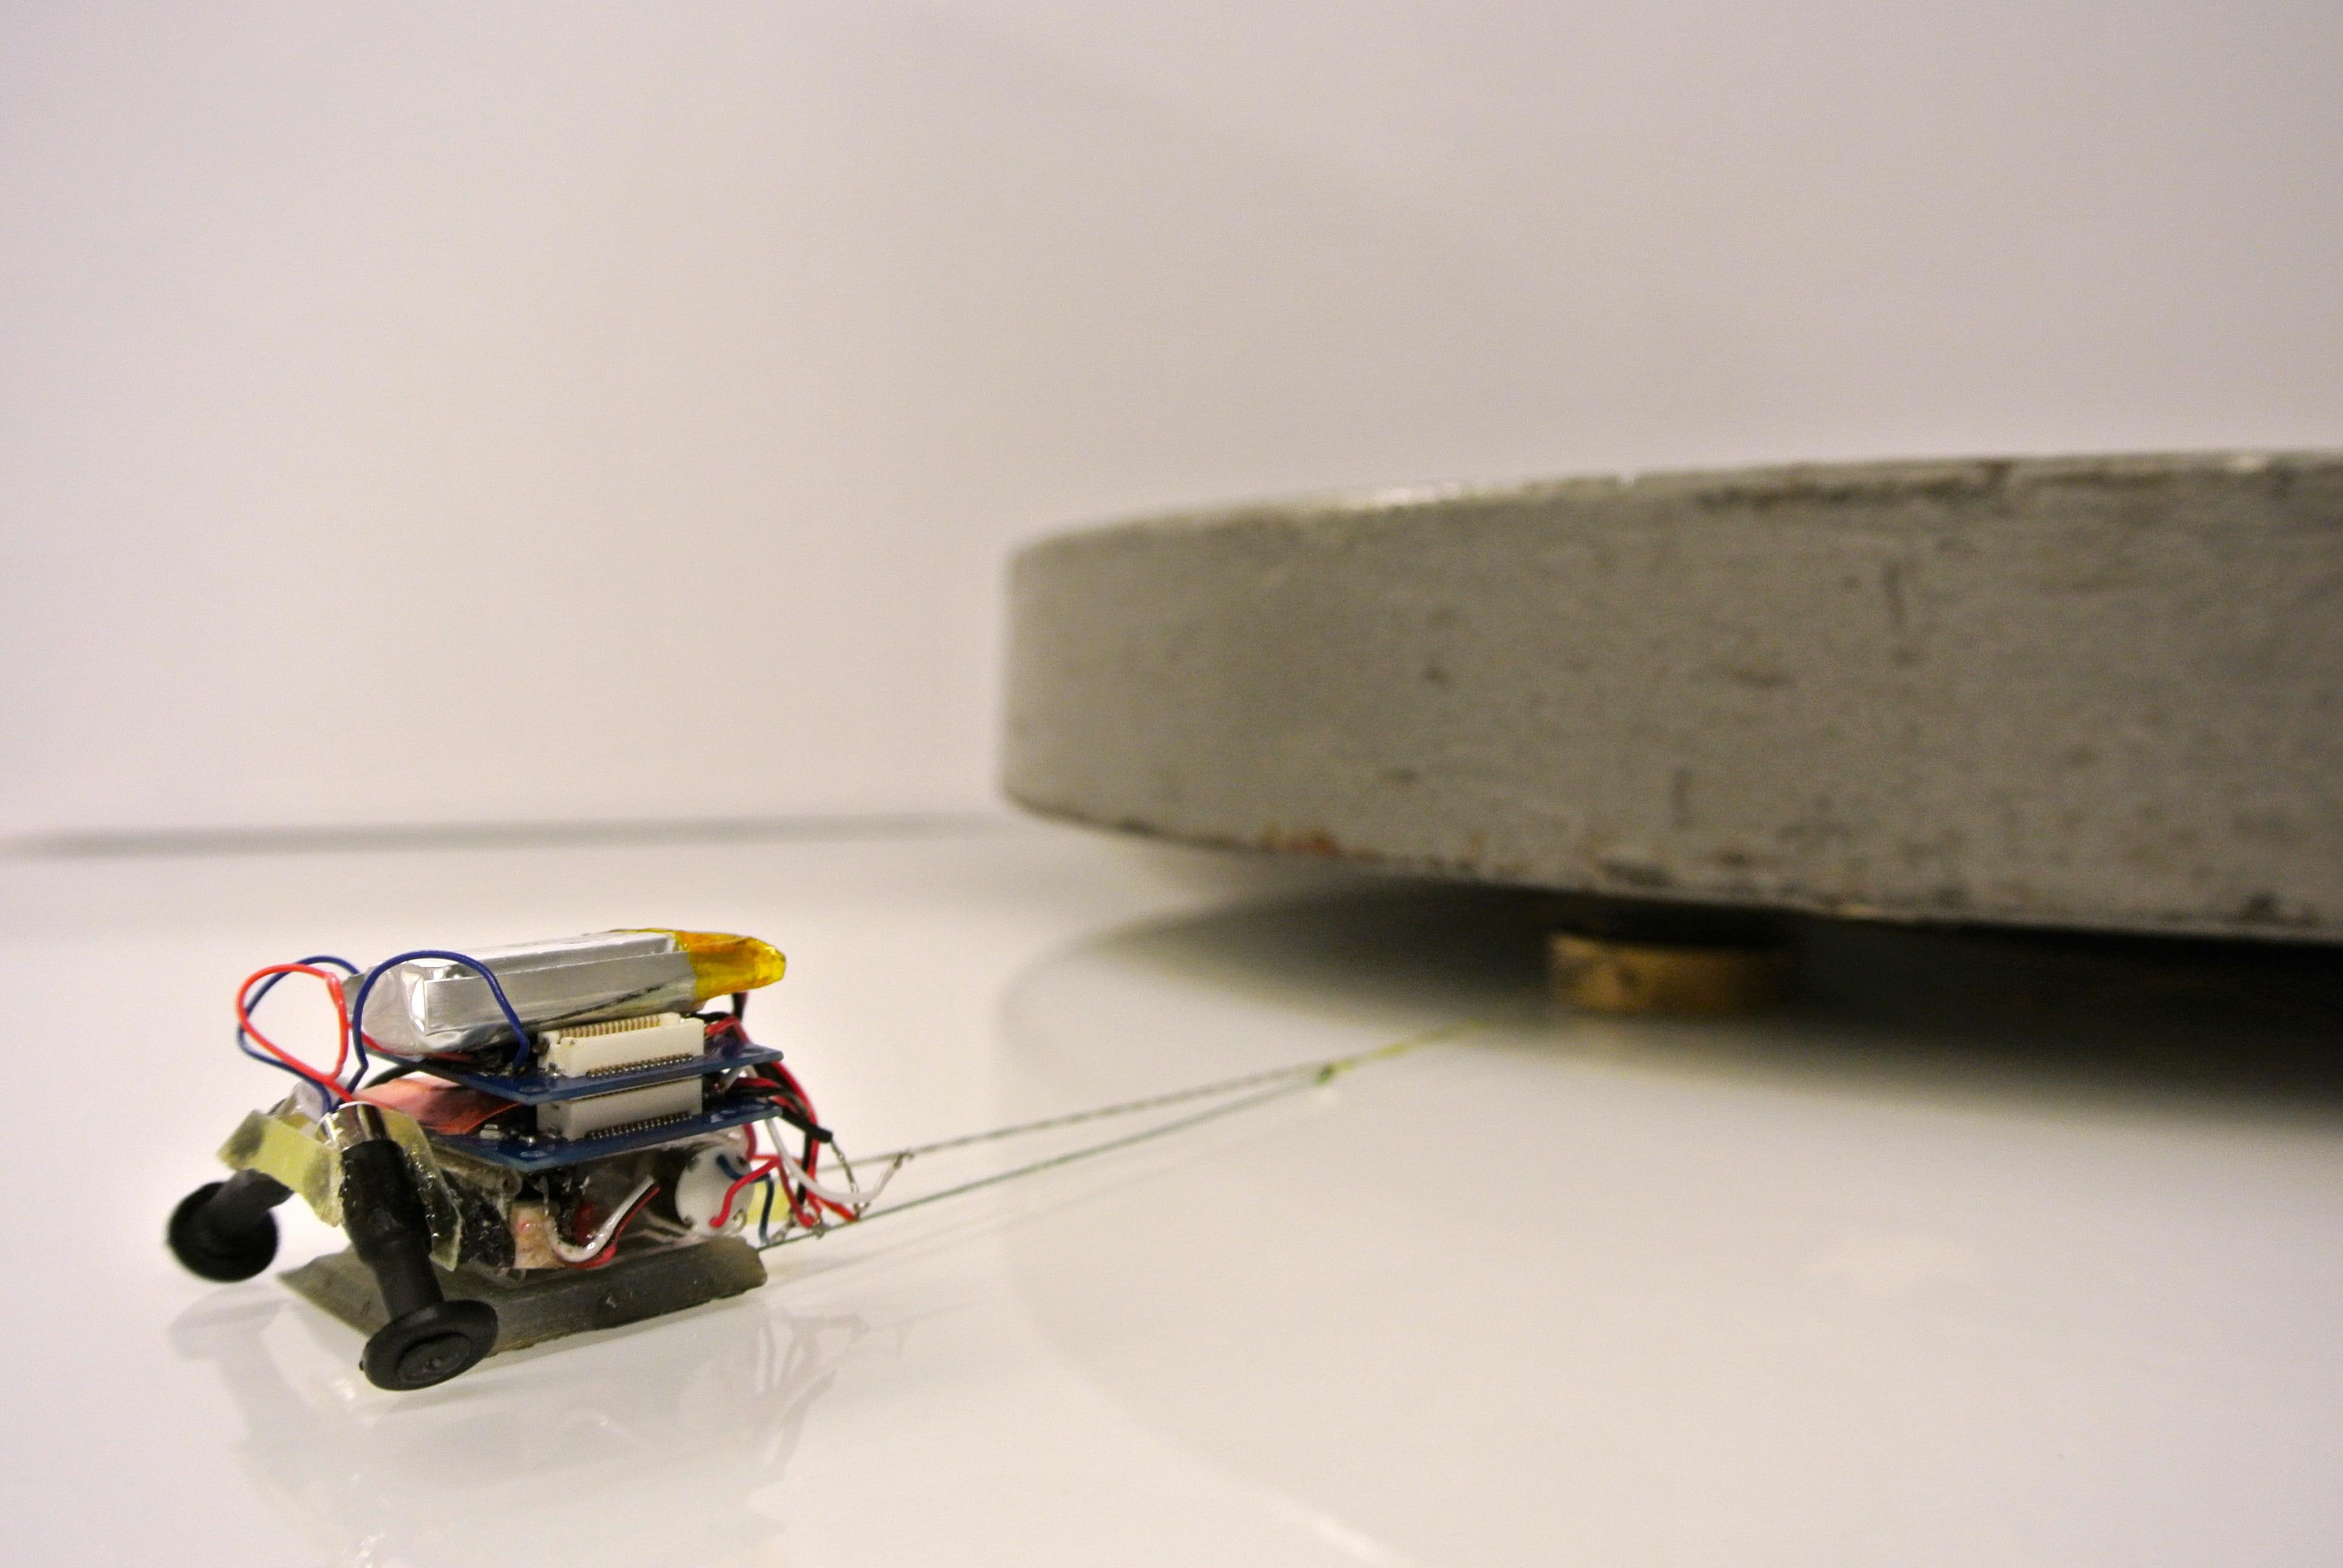 Robot geckos use the force